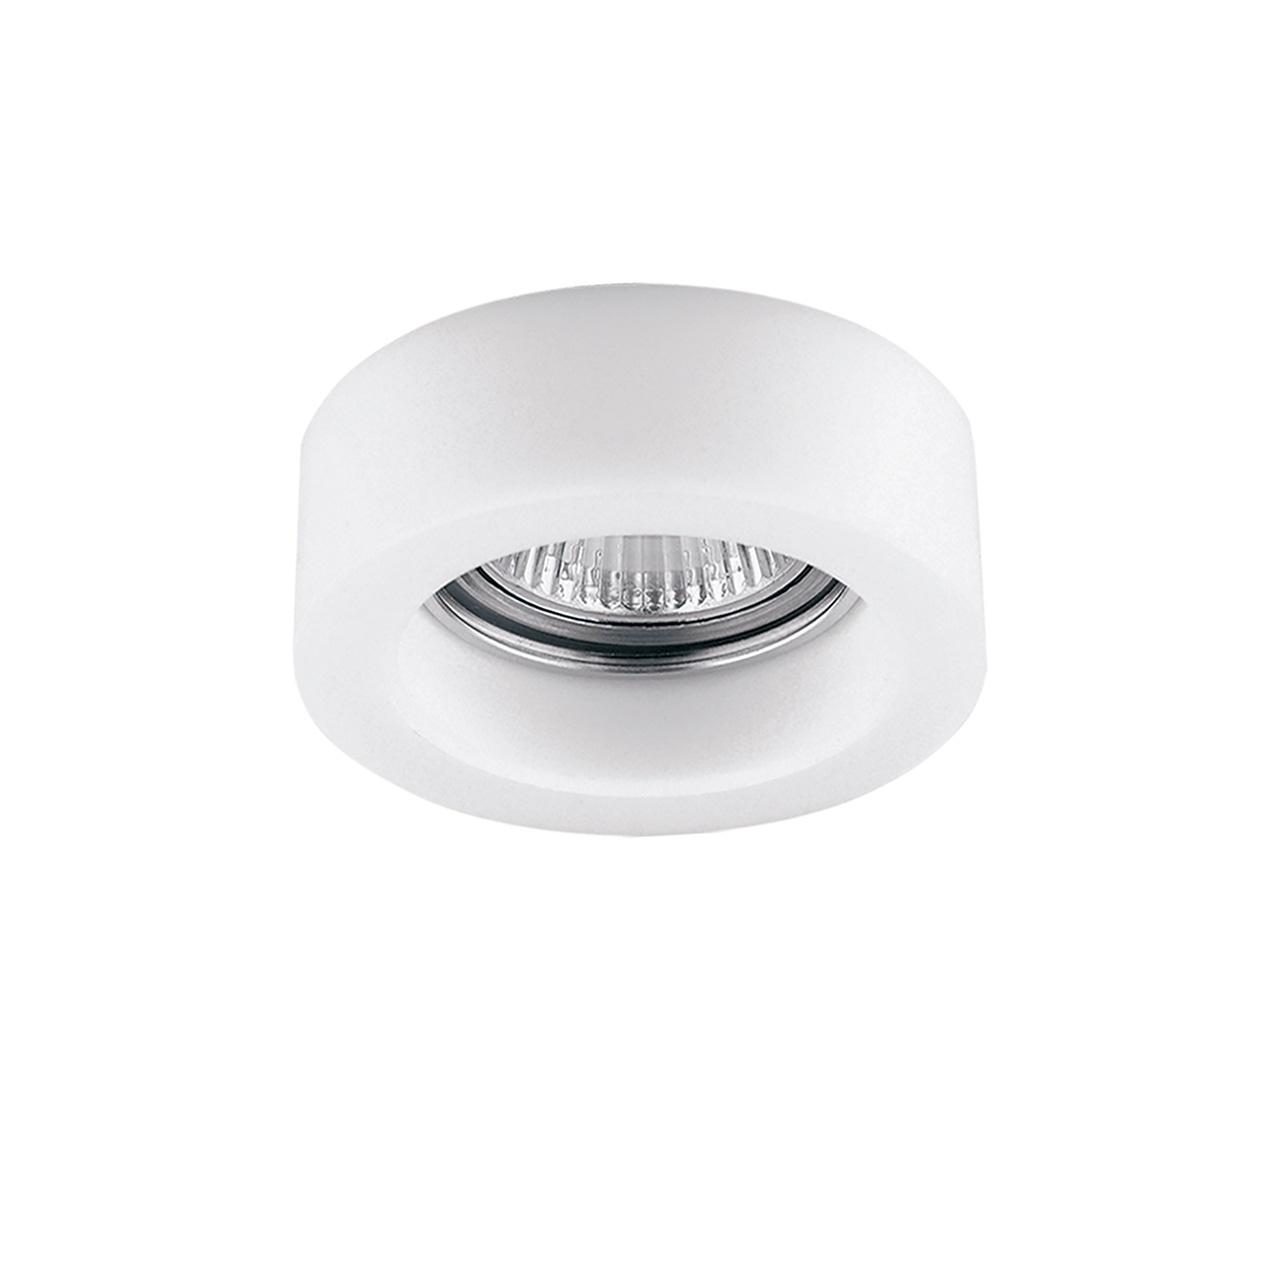 Rozetkaua - Рабочая лампа IKEA TERTIAL настольная с